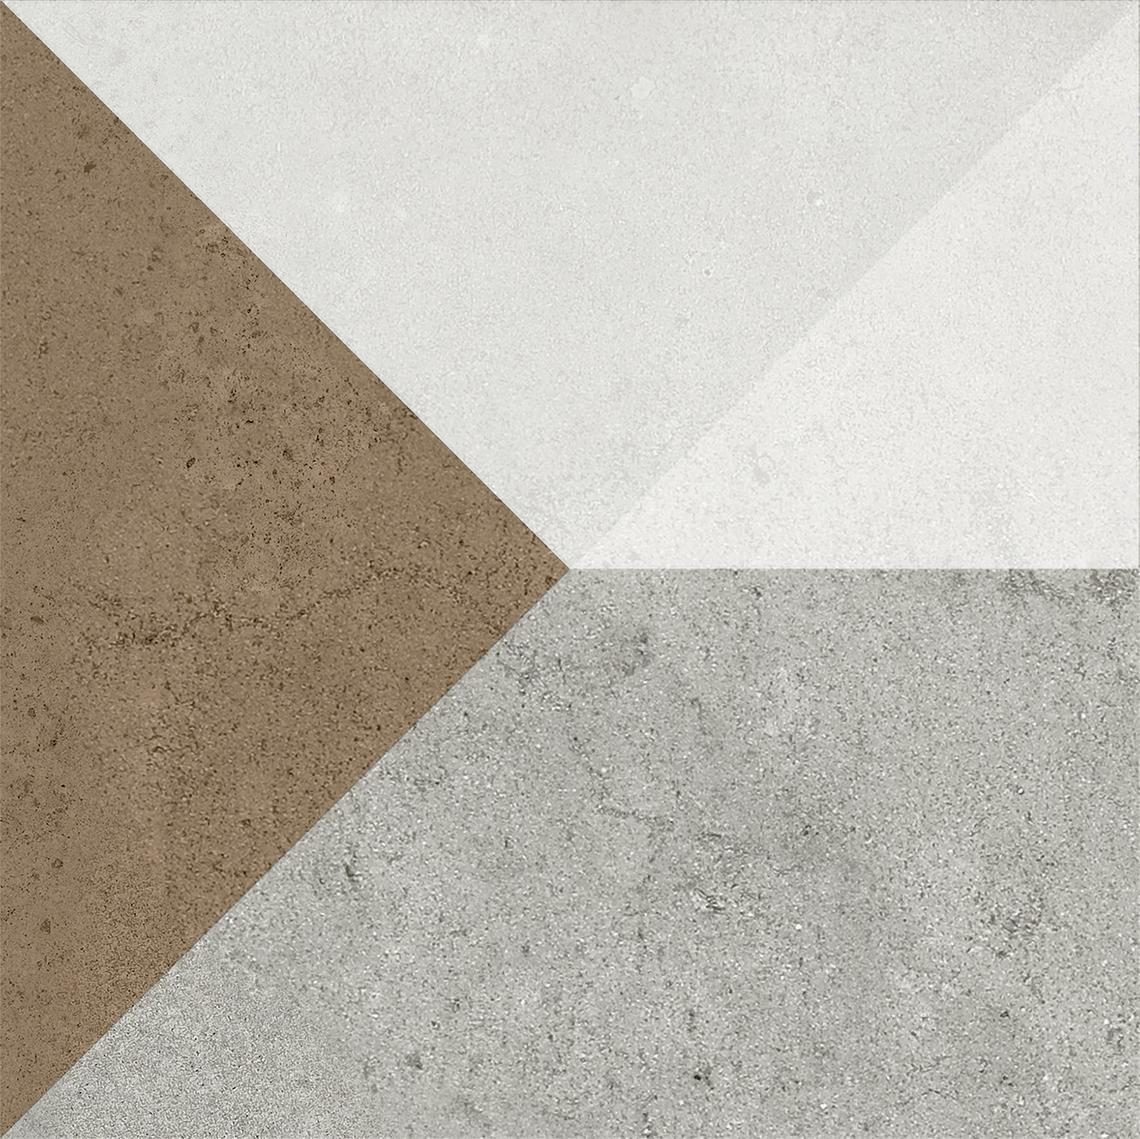 NAPOLI CHIC OCHRE (20x20)